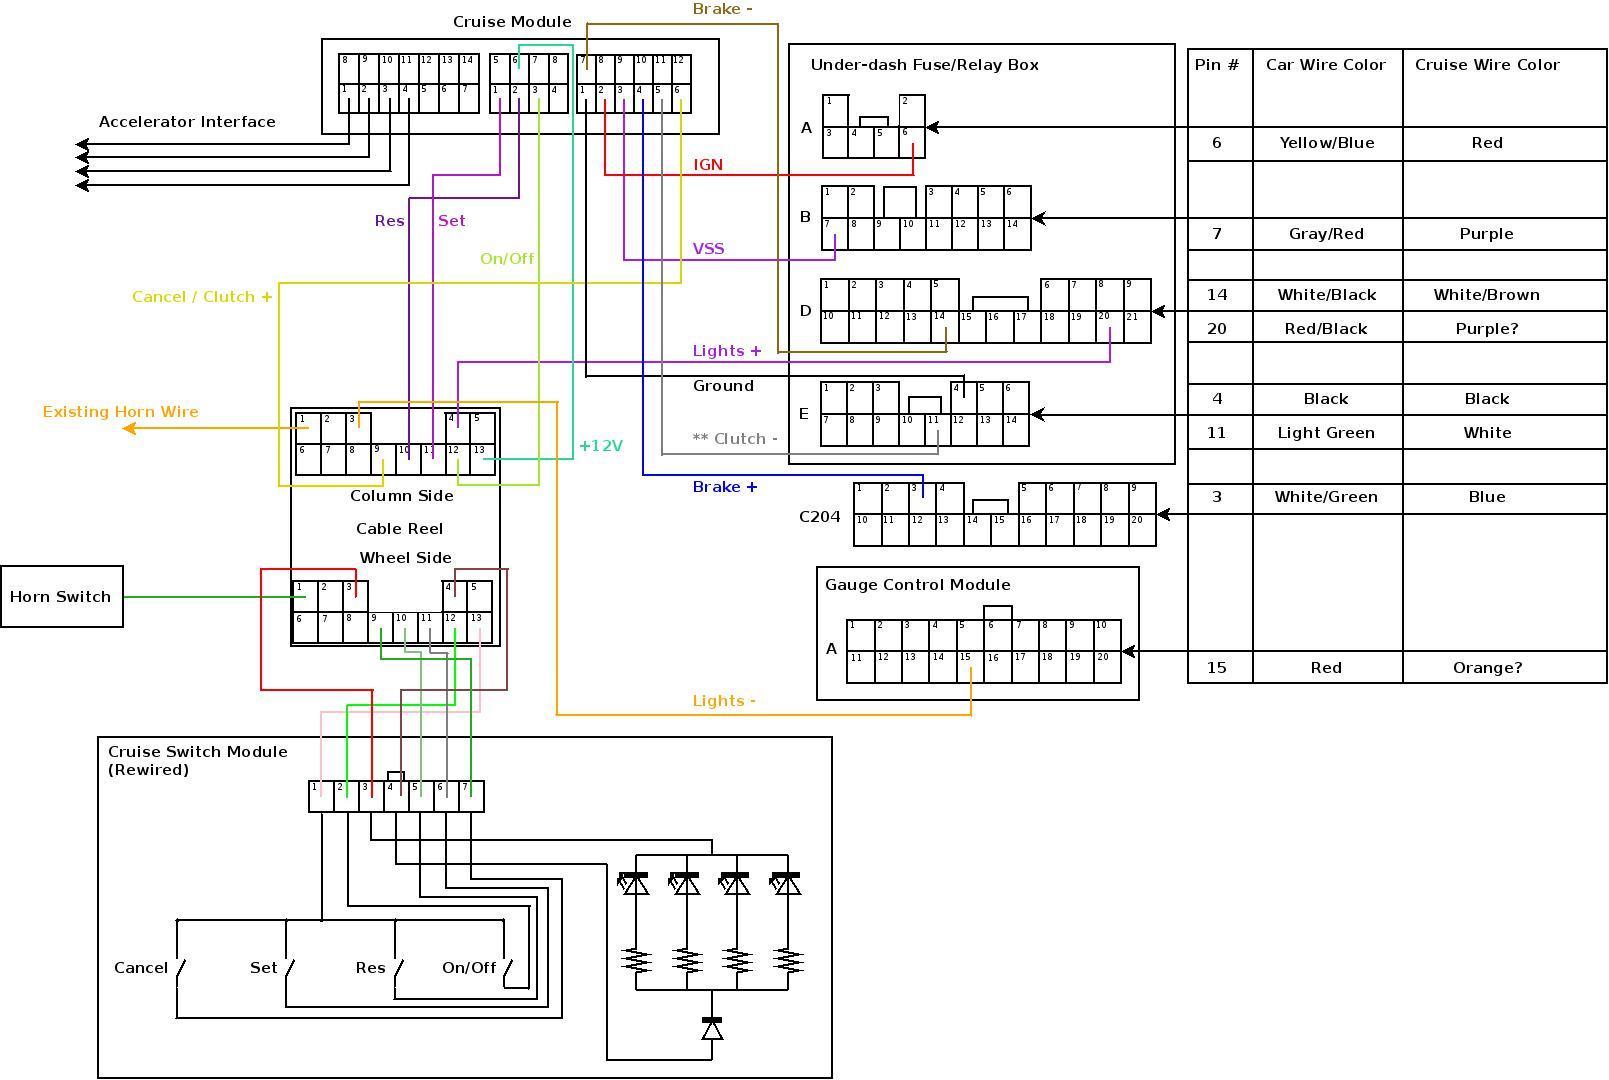 [QMVU_8575]  CL_0631] Honda Fit Wiring Diagram Free Download Download Diagram | Wiring Diagram For A Pole Barn Free Download |  | Eumqu Tivexi Kumb Denli Mohammedshrine Librar Wiring 101